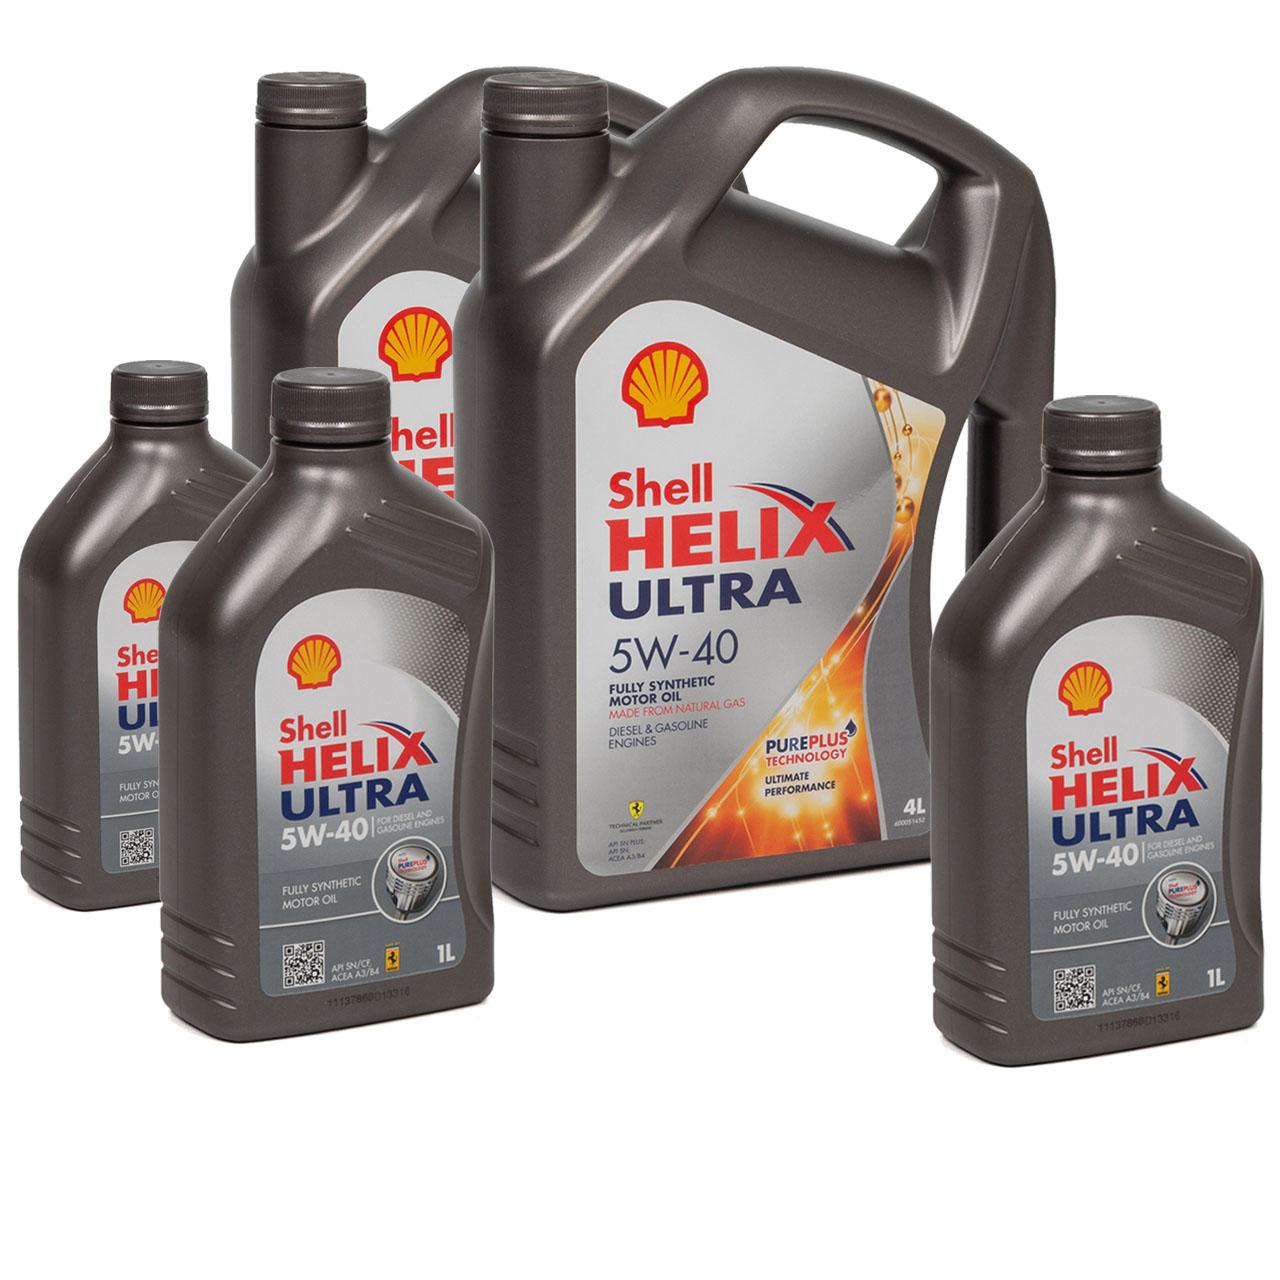 SHELL Motoröl Öl HELIX ULTRA 5W-40 5W40 MB 226/229.5 VW 502/505.00 - 11 Liter